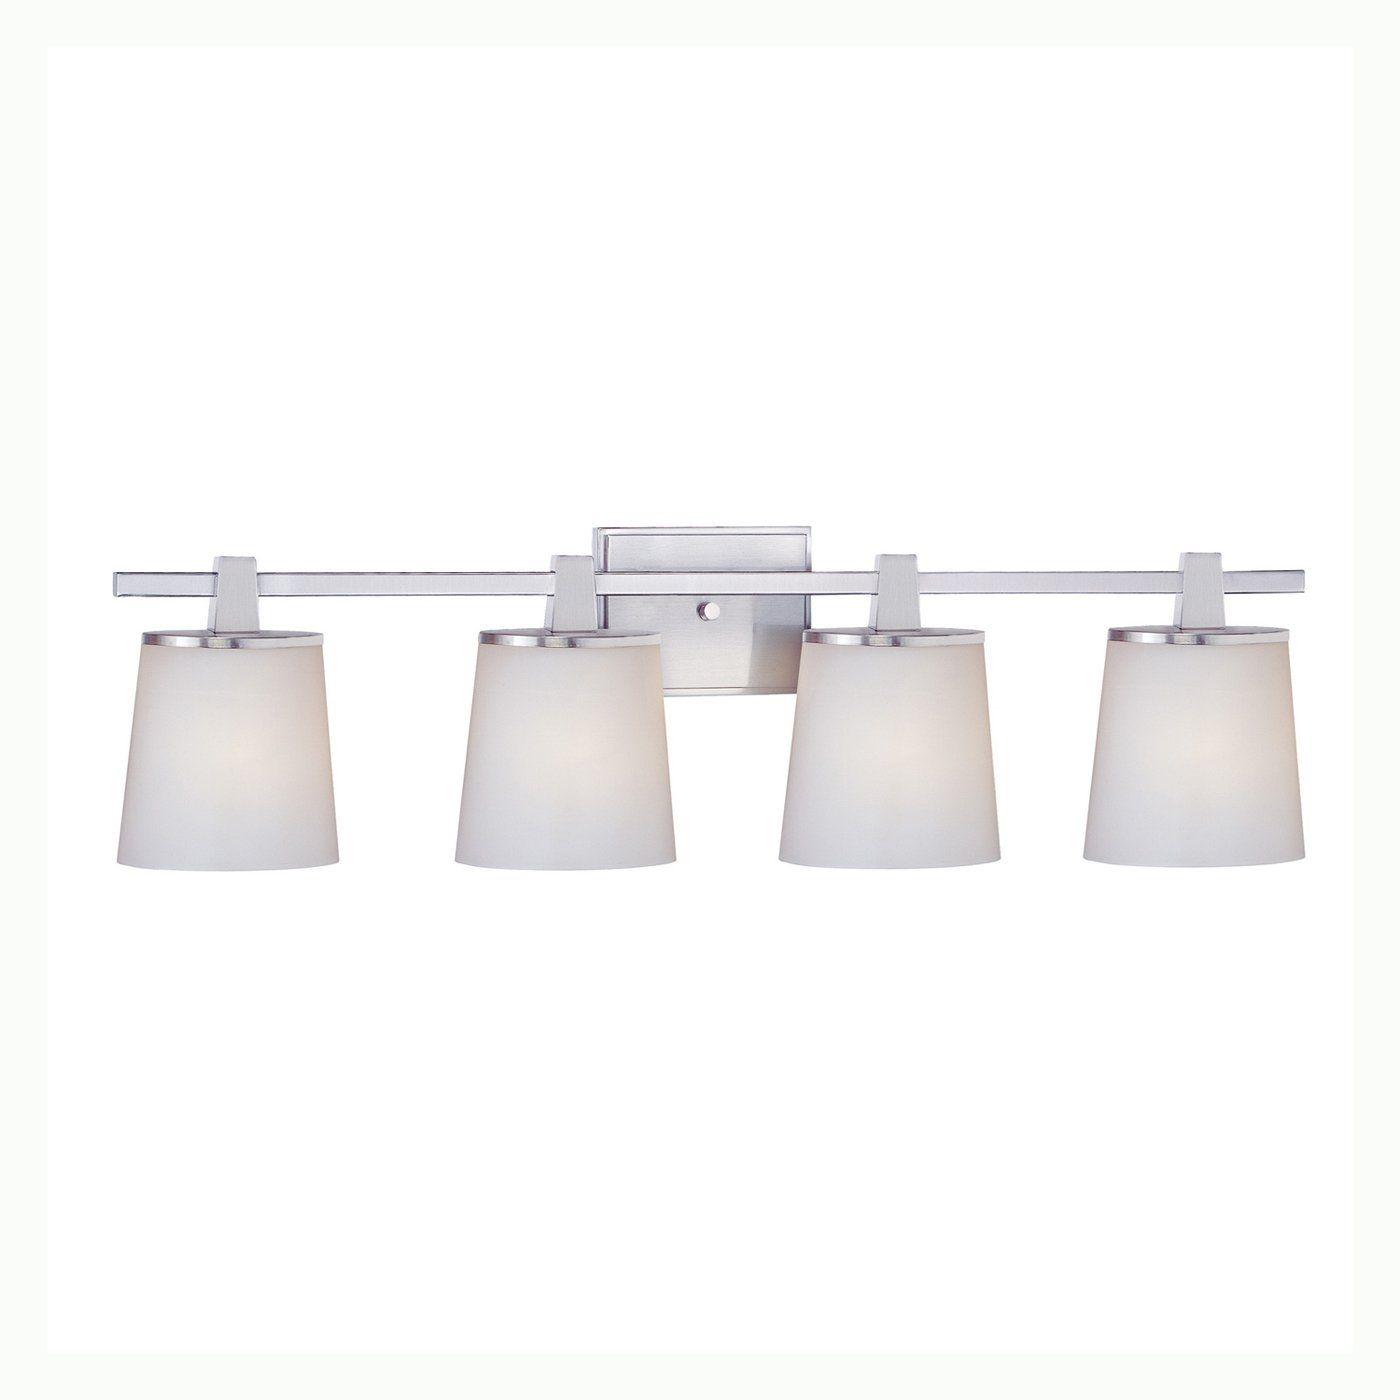 Dolan Designs 3784 4-Light Ellipse Bathroom Vanity